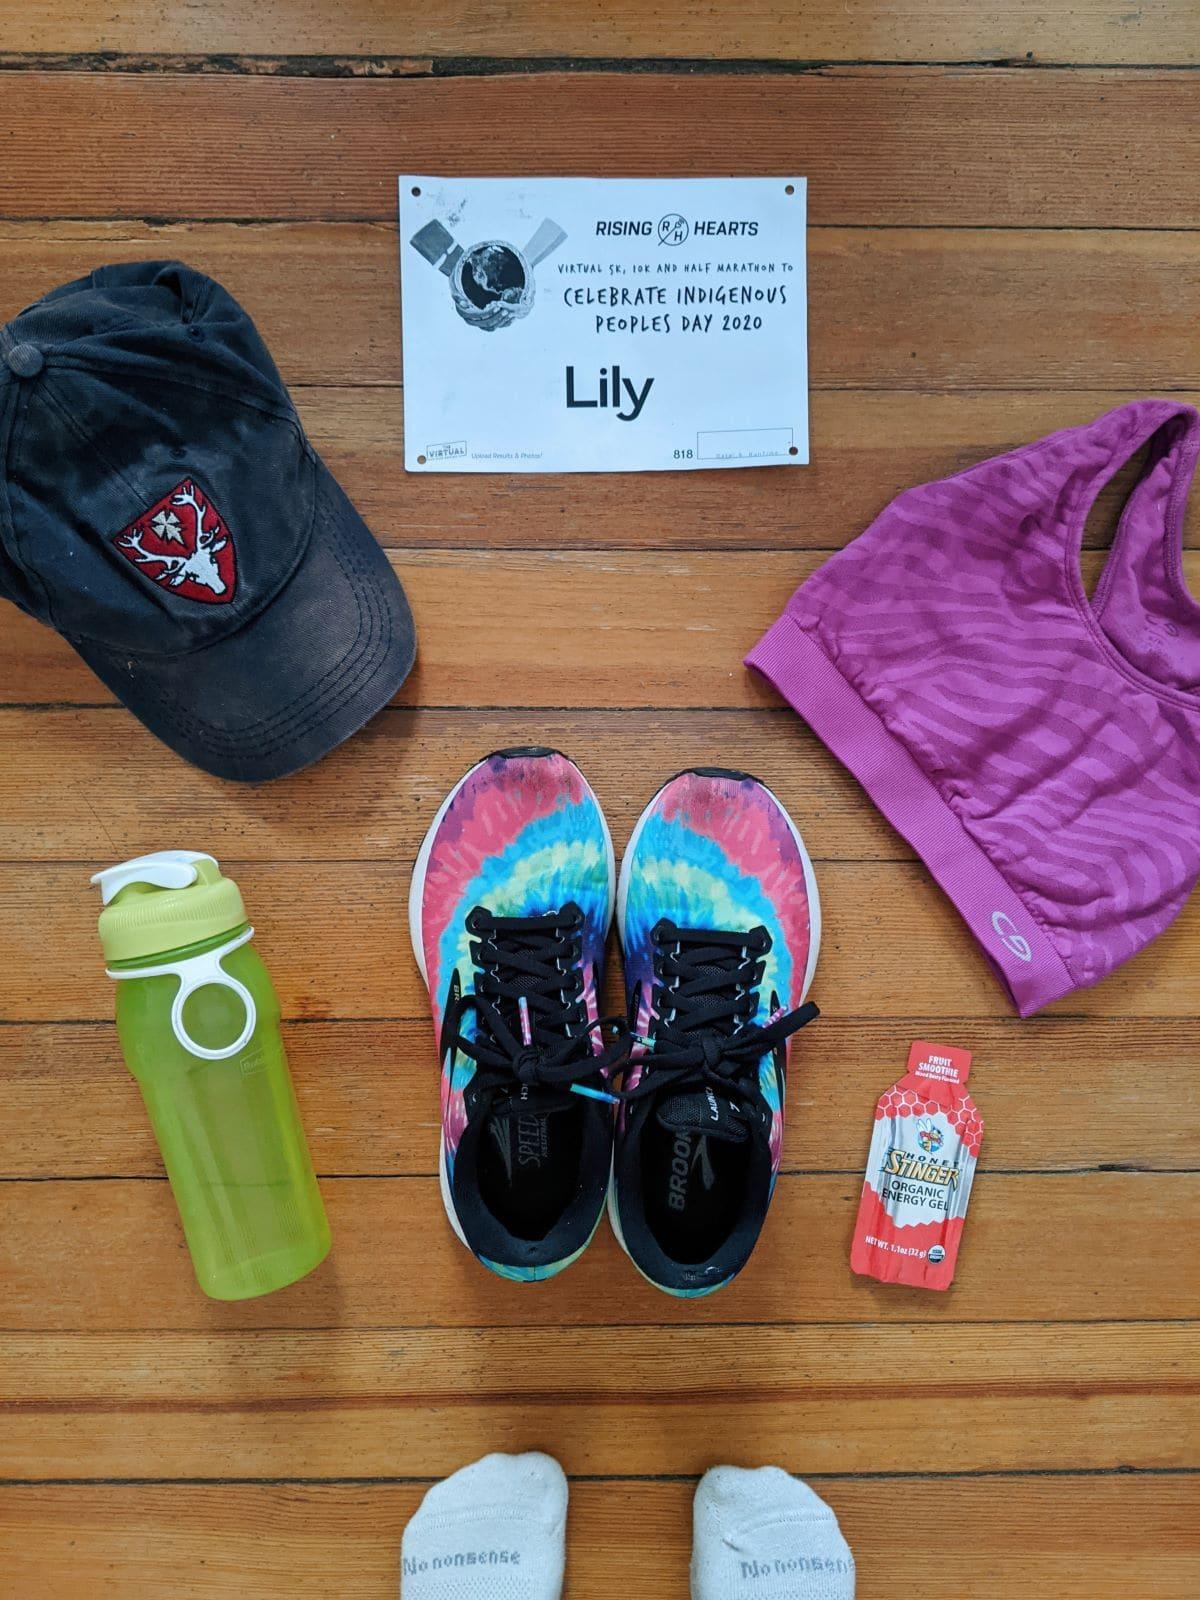 flatlay of running gear with a baseball cap, shoes, gel, sports bra, water bottle, and race bib